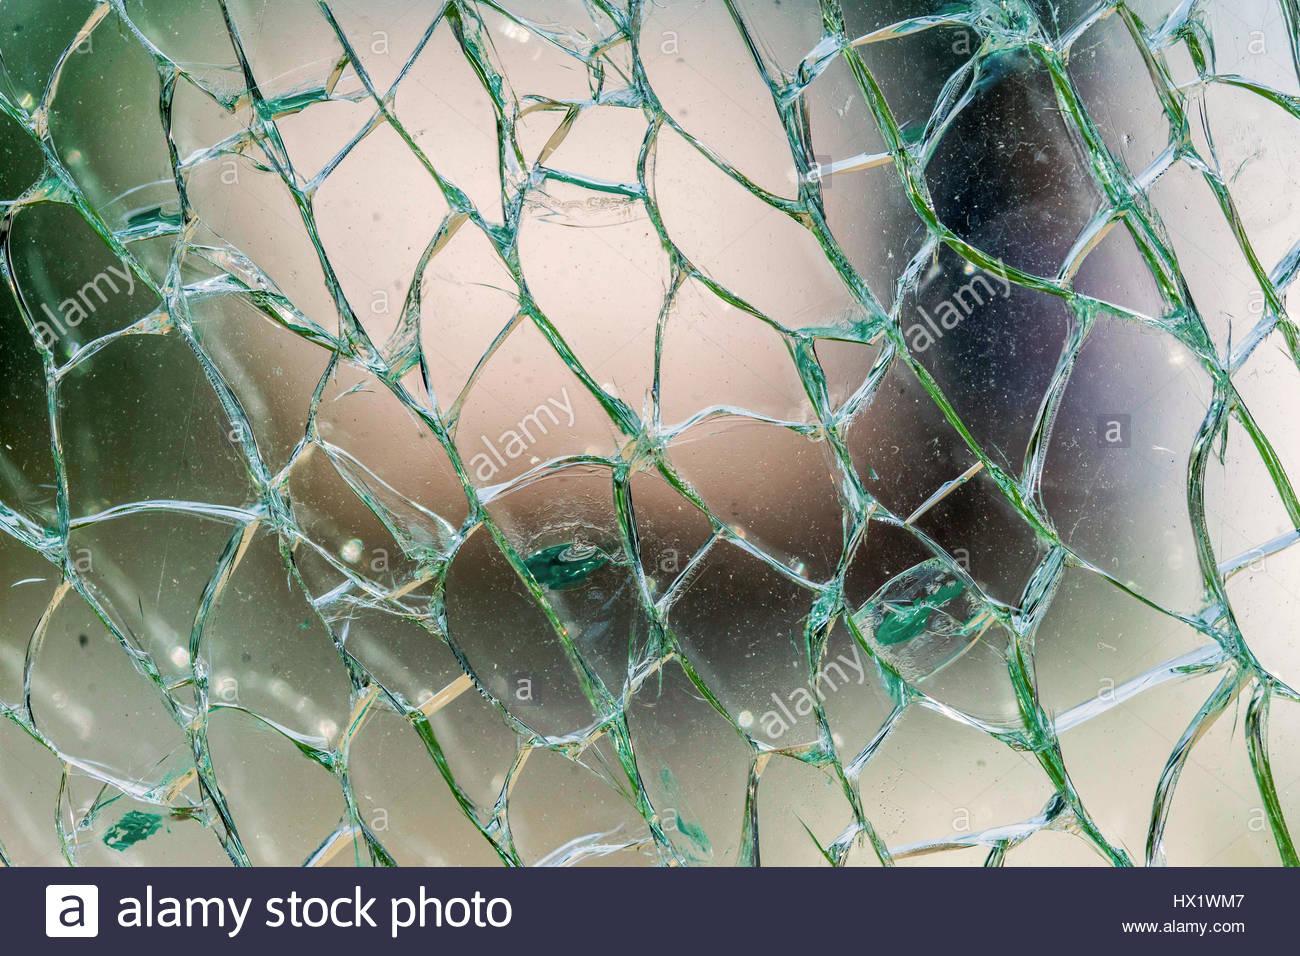 Broken security glass Stock Photo: 136495751 - Alamy